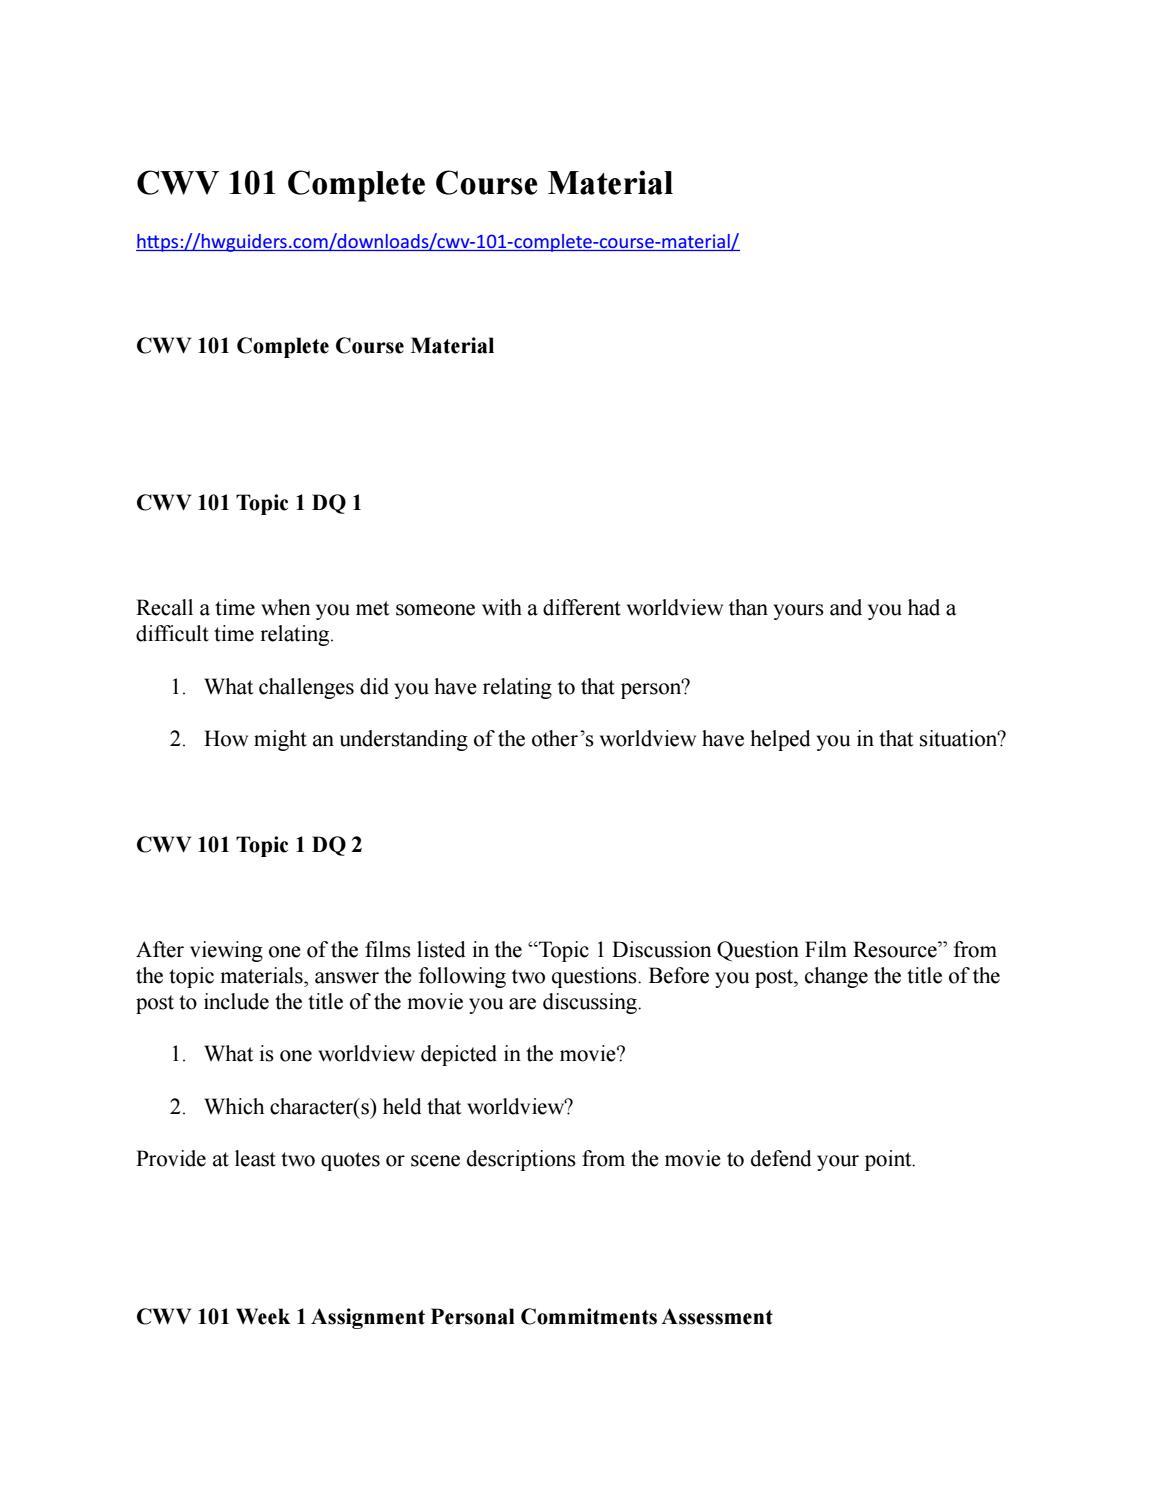 module 3 cwv 101 Back to 'cwv 101' form signatures  module 6 stewardship catdocx  module 6 stewardship c the fall cat mod 4docx.